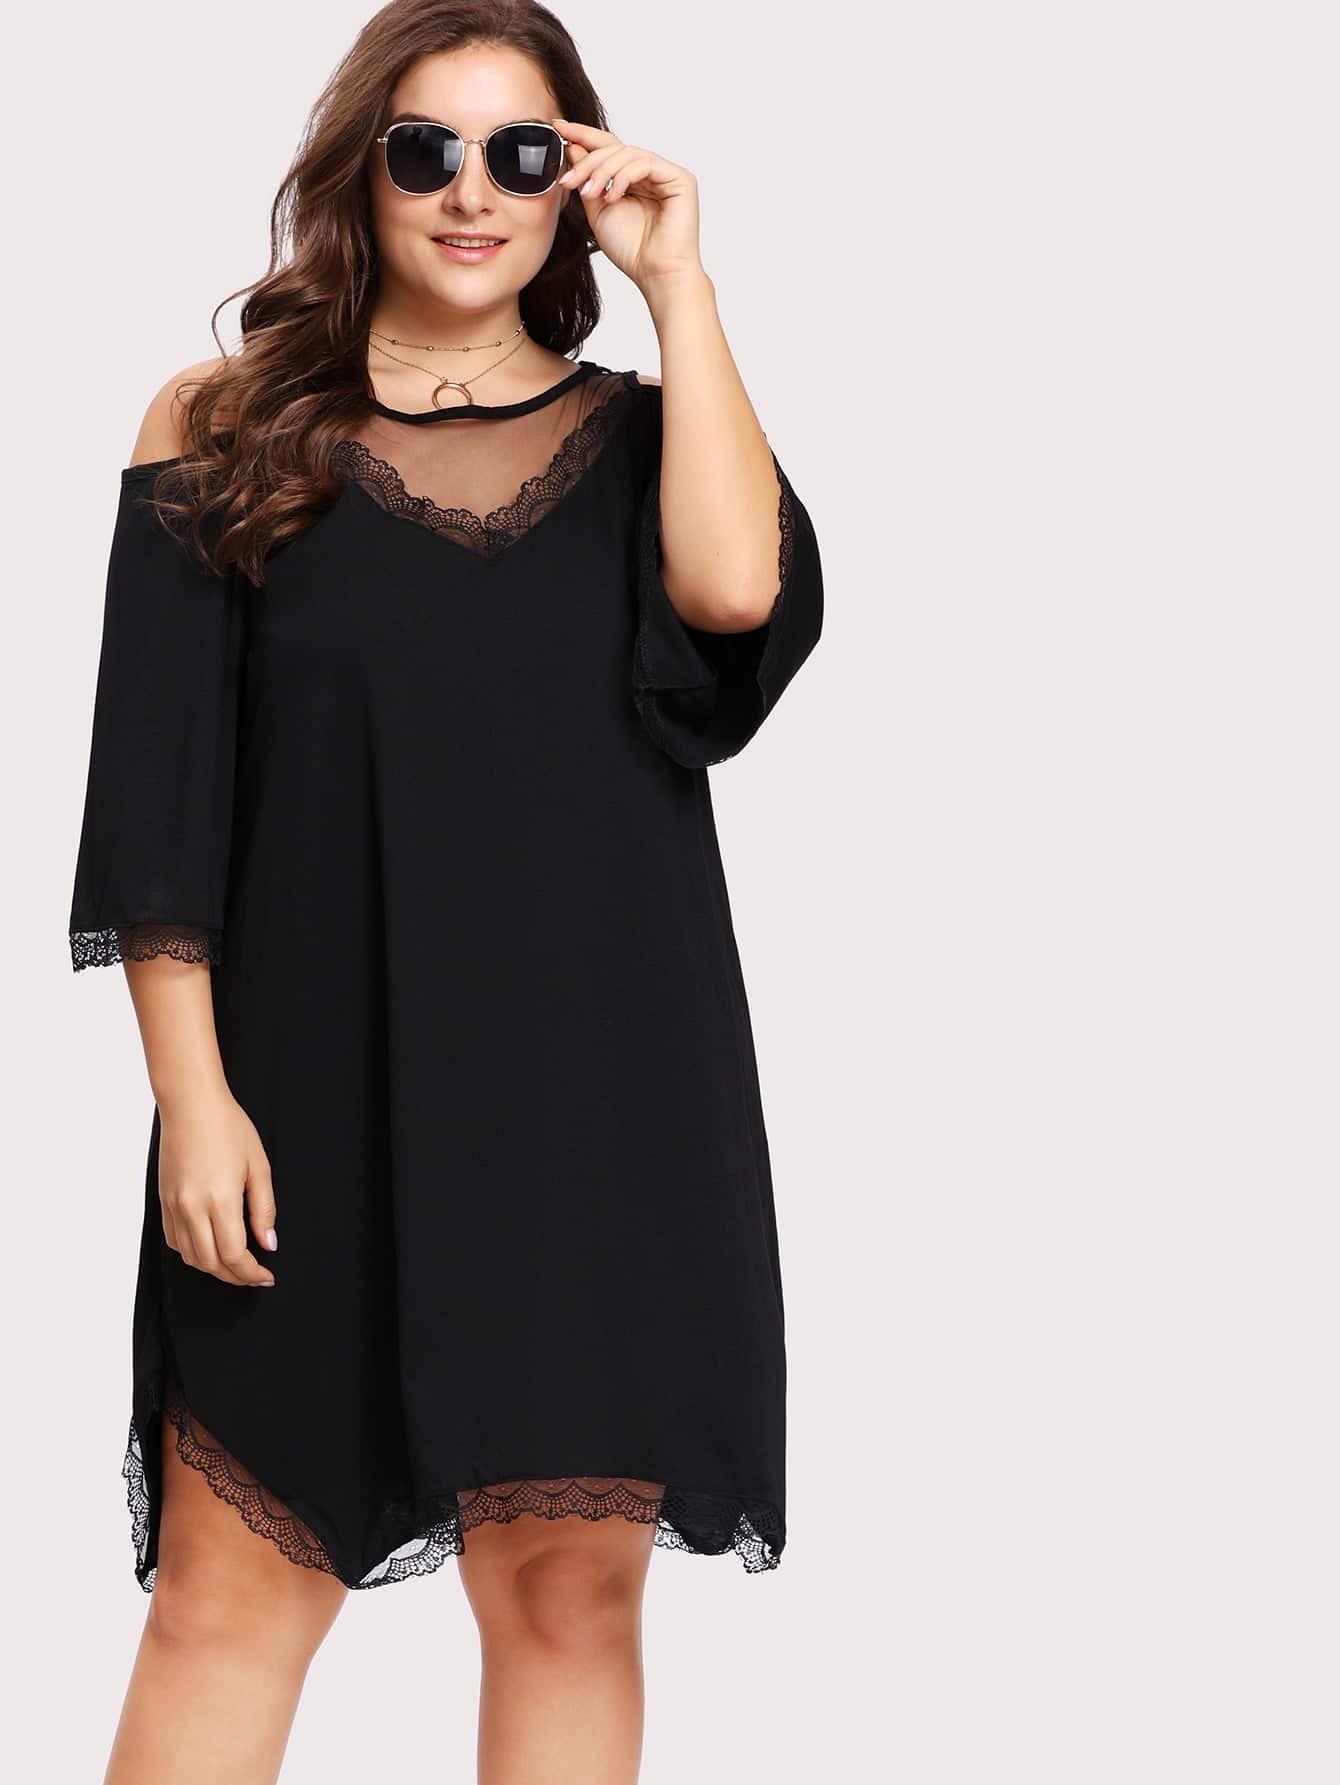 Mesh Insert Lace Trim Open Shoulder Dress open back lace insert night dress